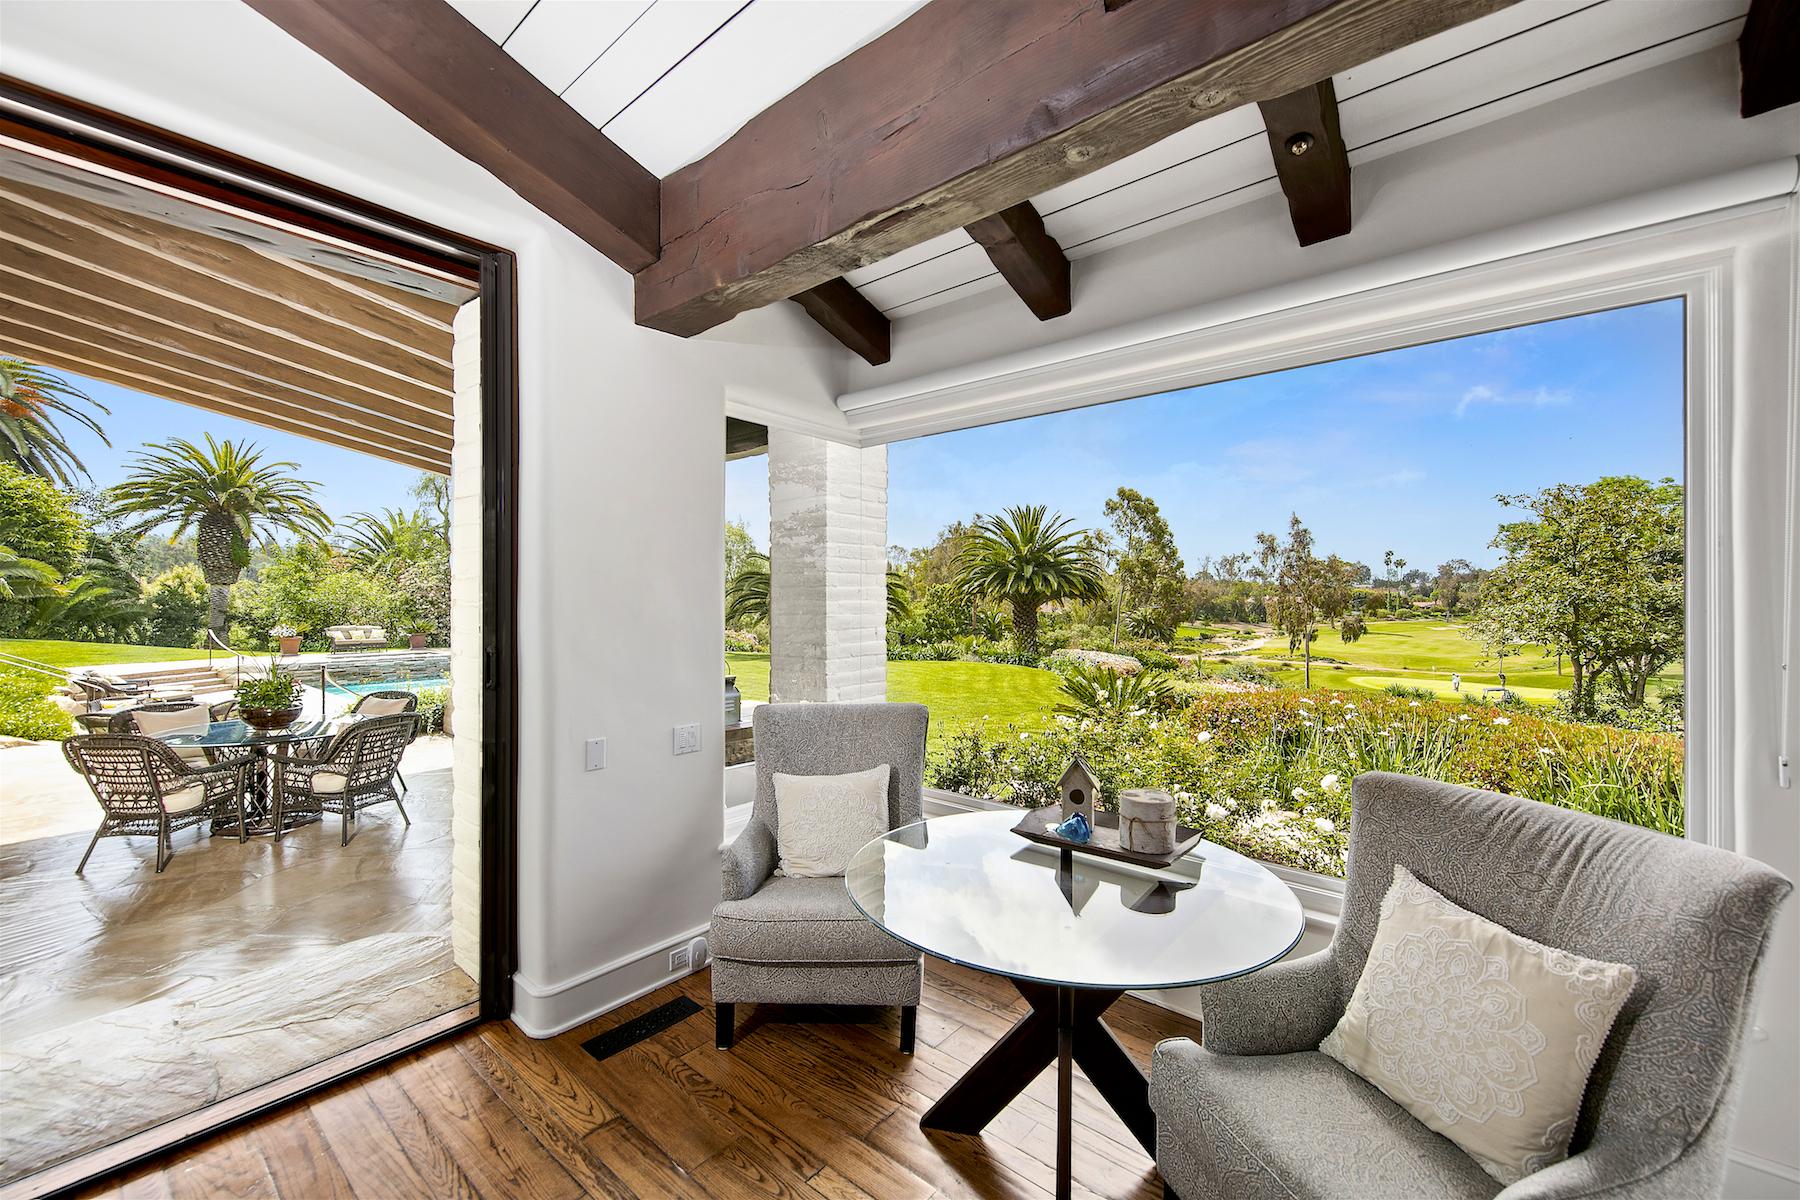 Sold 2019 Laura Represented Seller -  Rancho Santa Fe, CA 92067